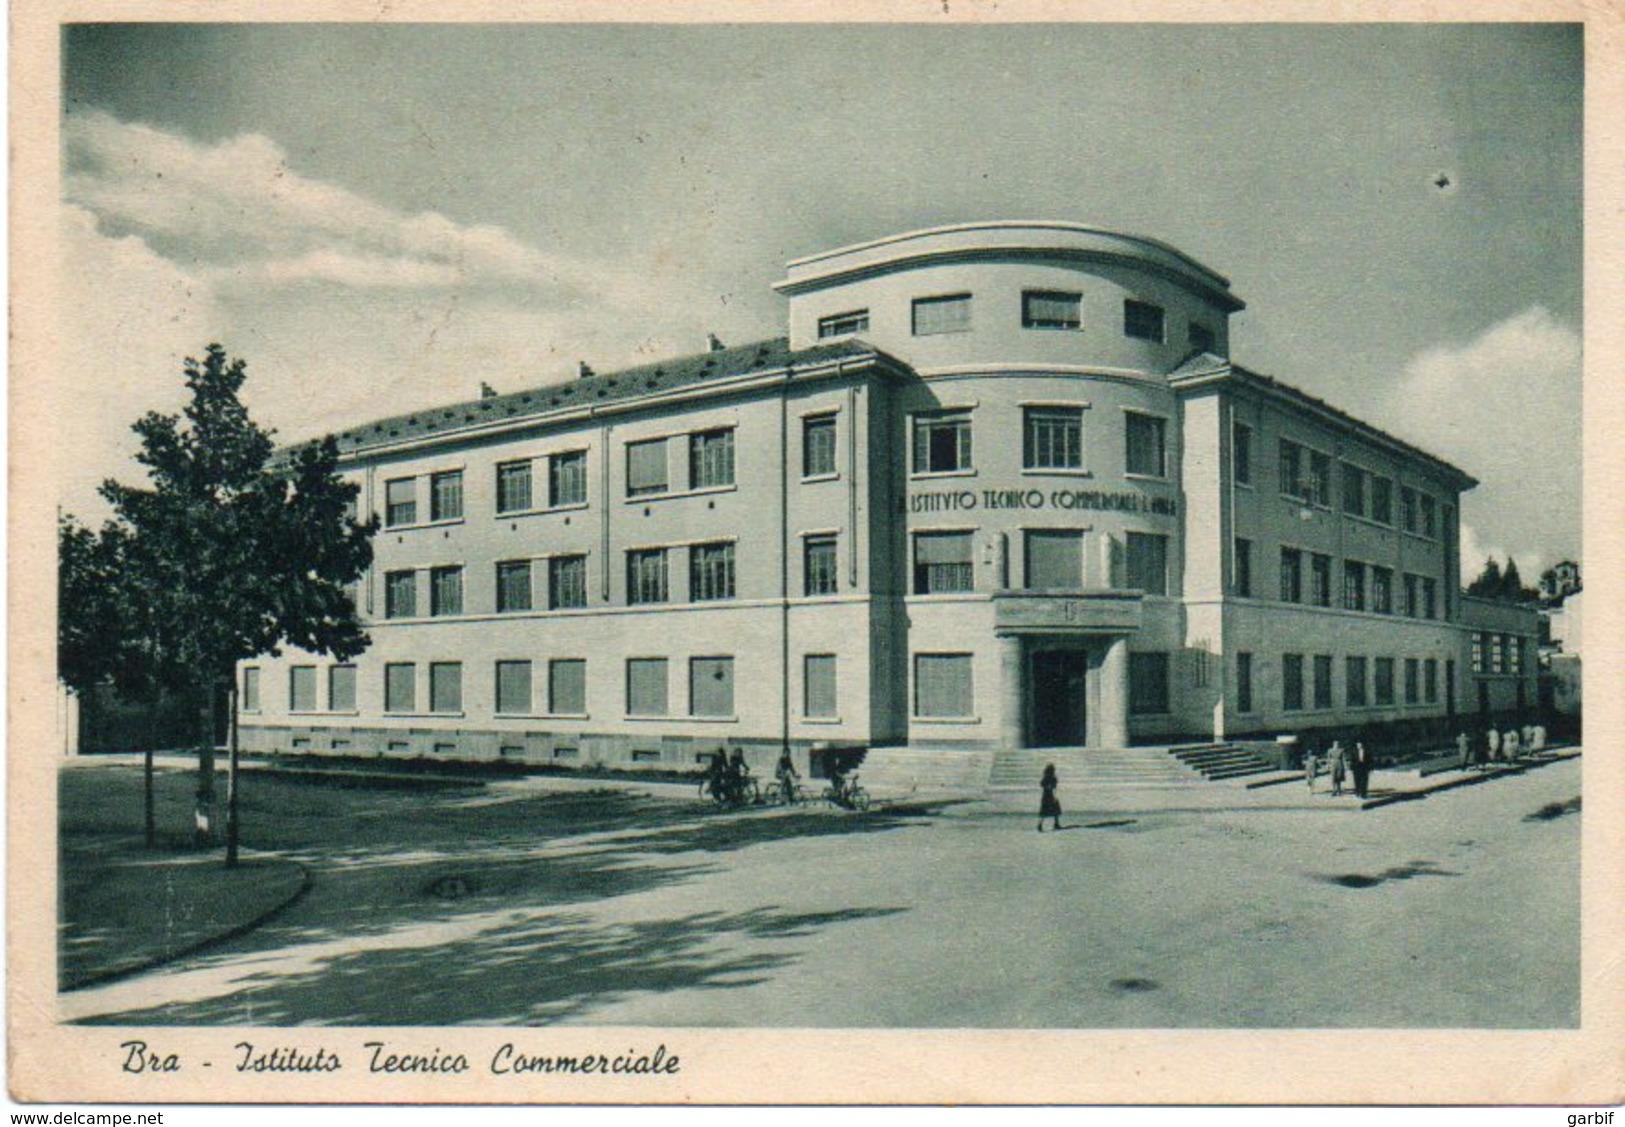 Cuneo - Bra - Istituto Tecnico Commerciale - Fg Vg1940 - Cuneo